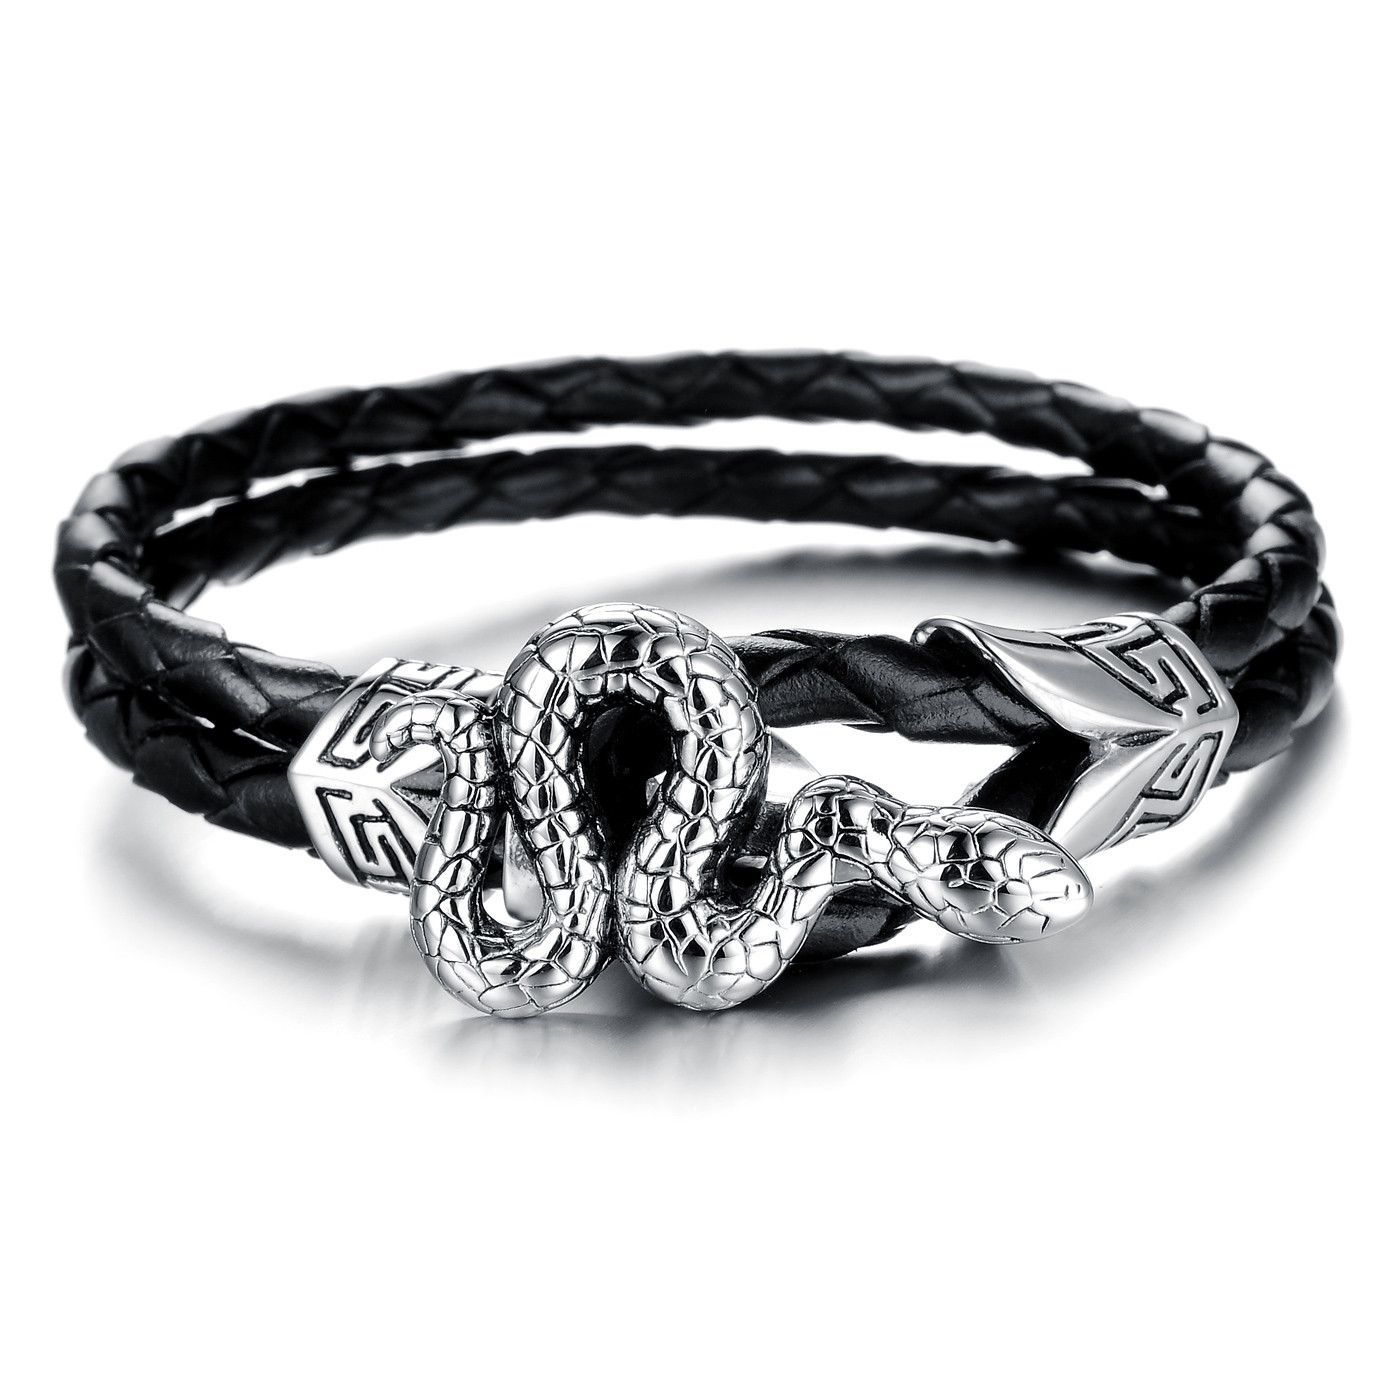 Fashion trendy wind creative personal snake man titanium steel